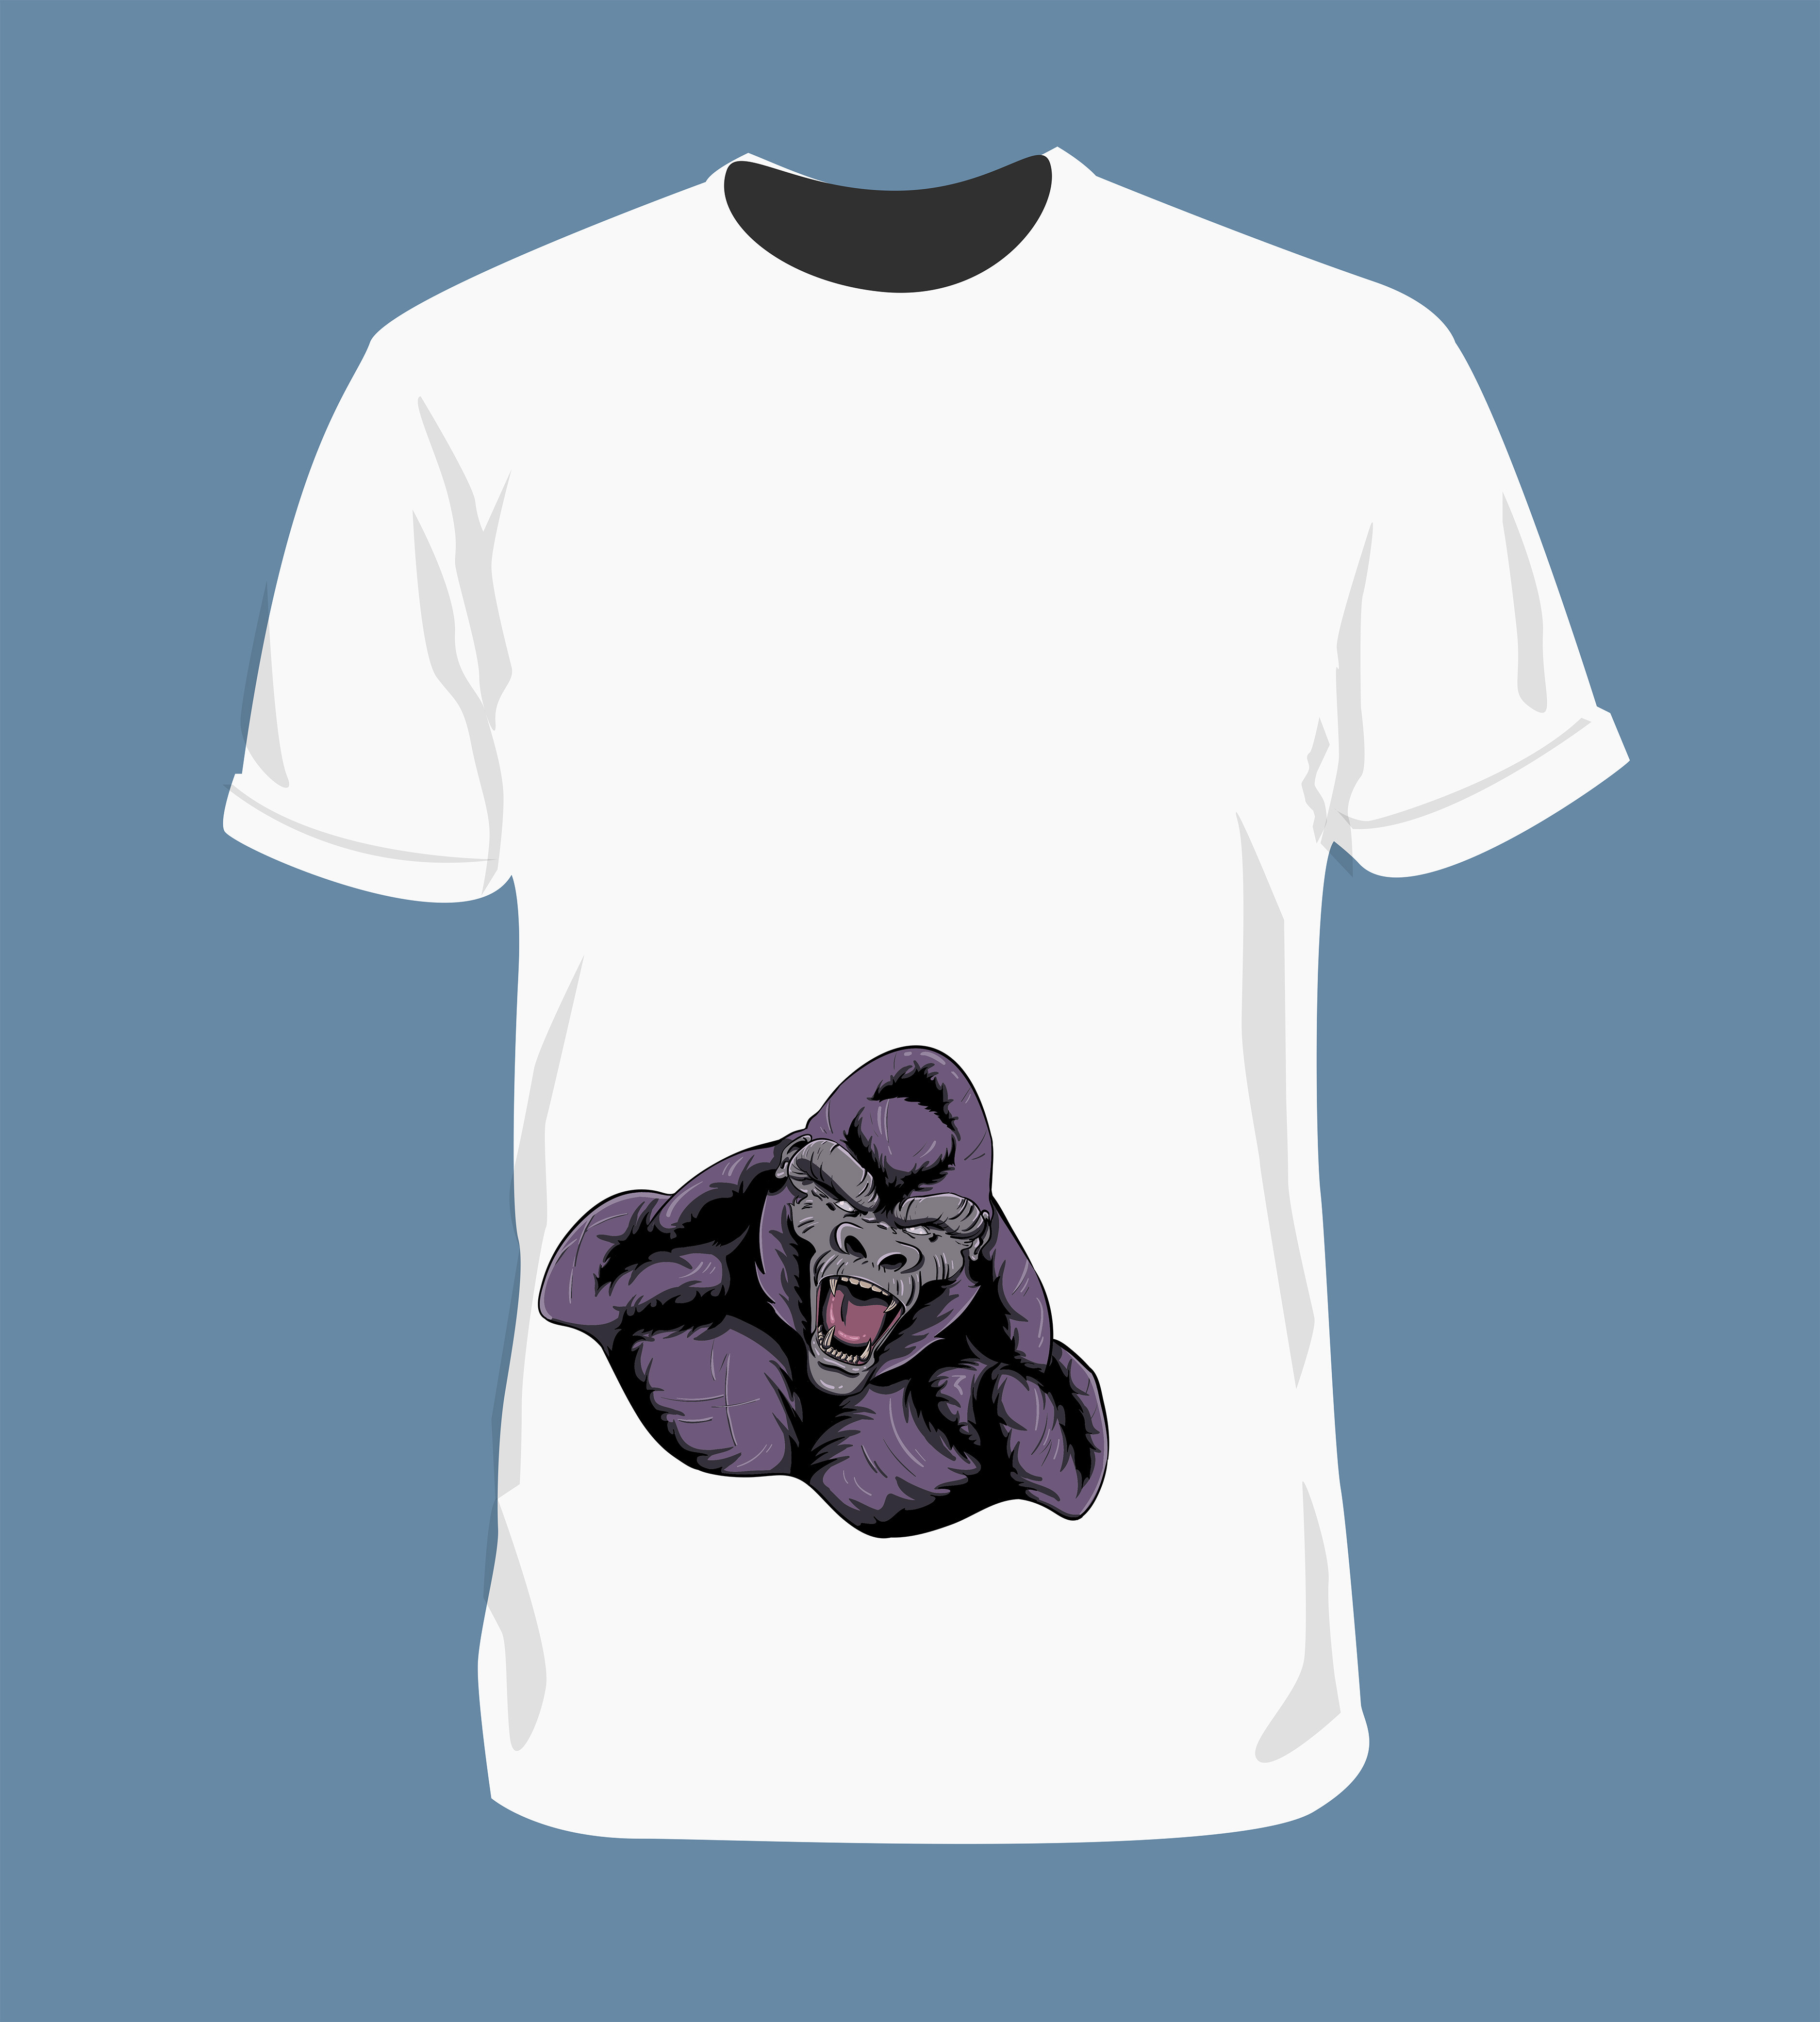 Vector illustration for tshirt design for eNVy Unltd.